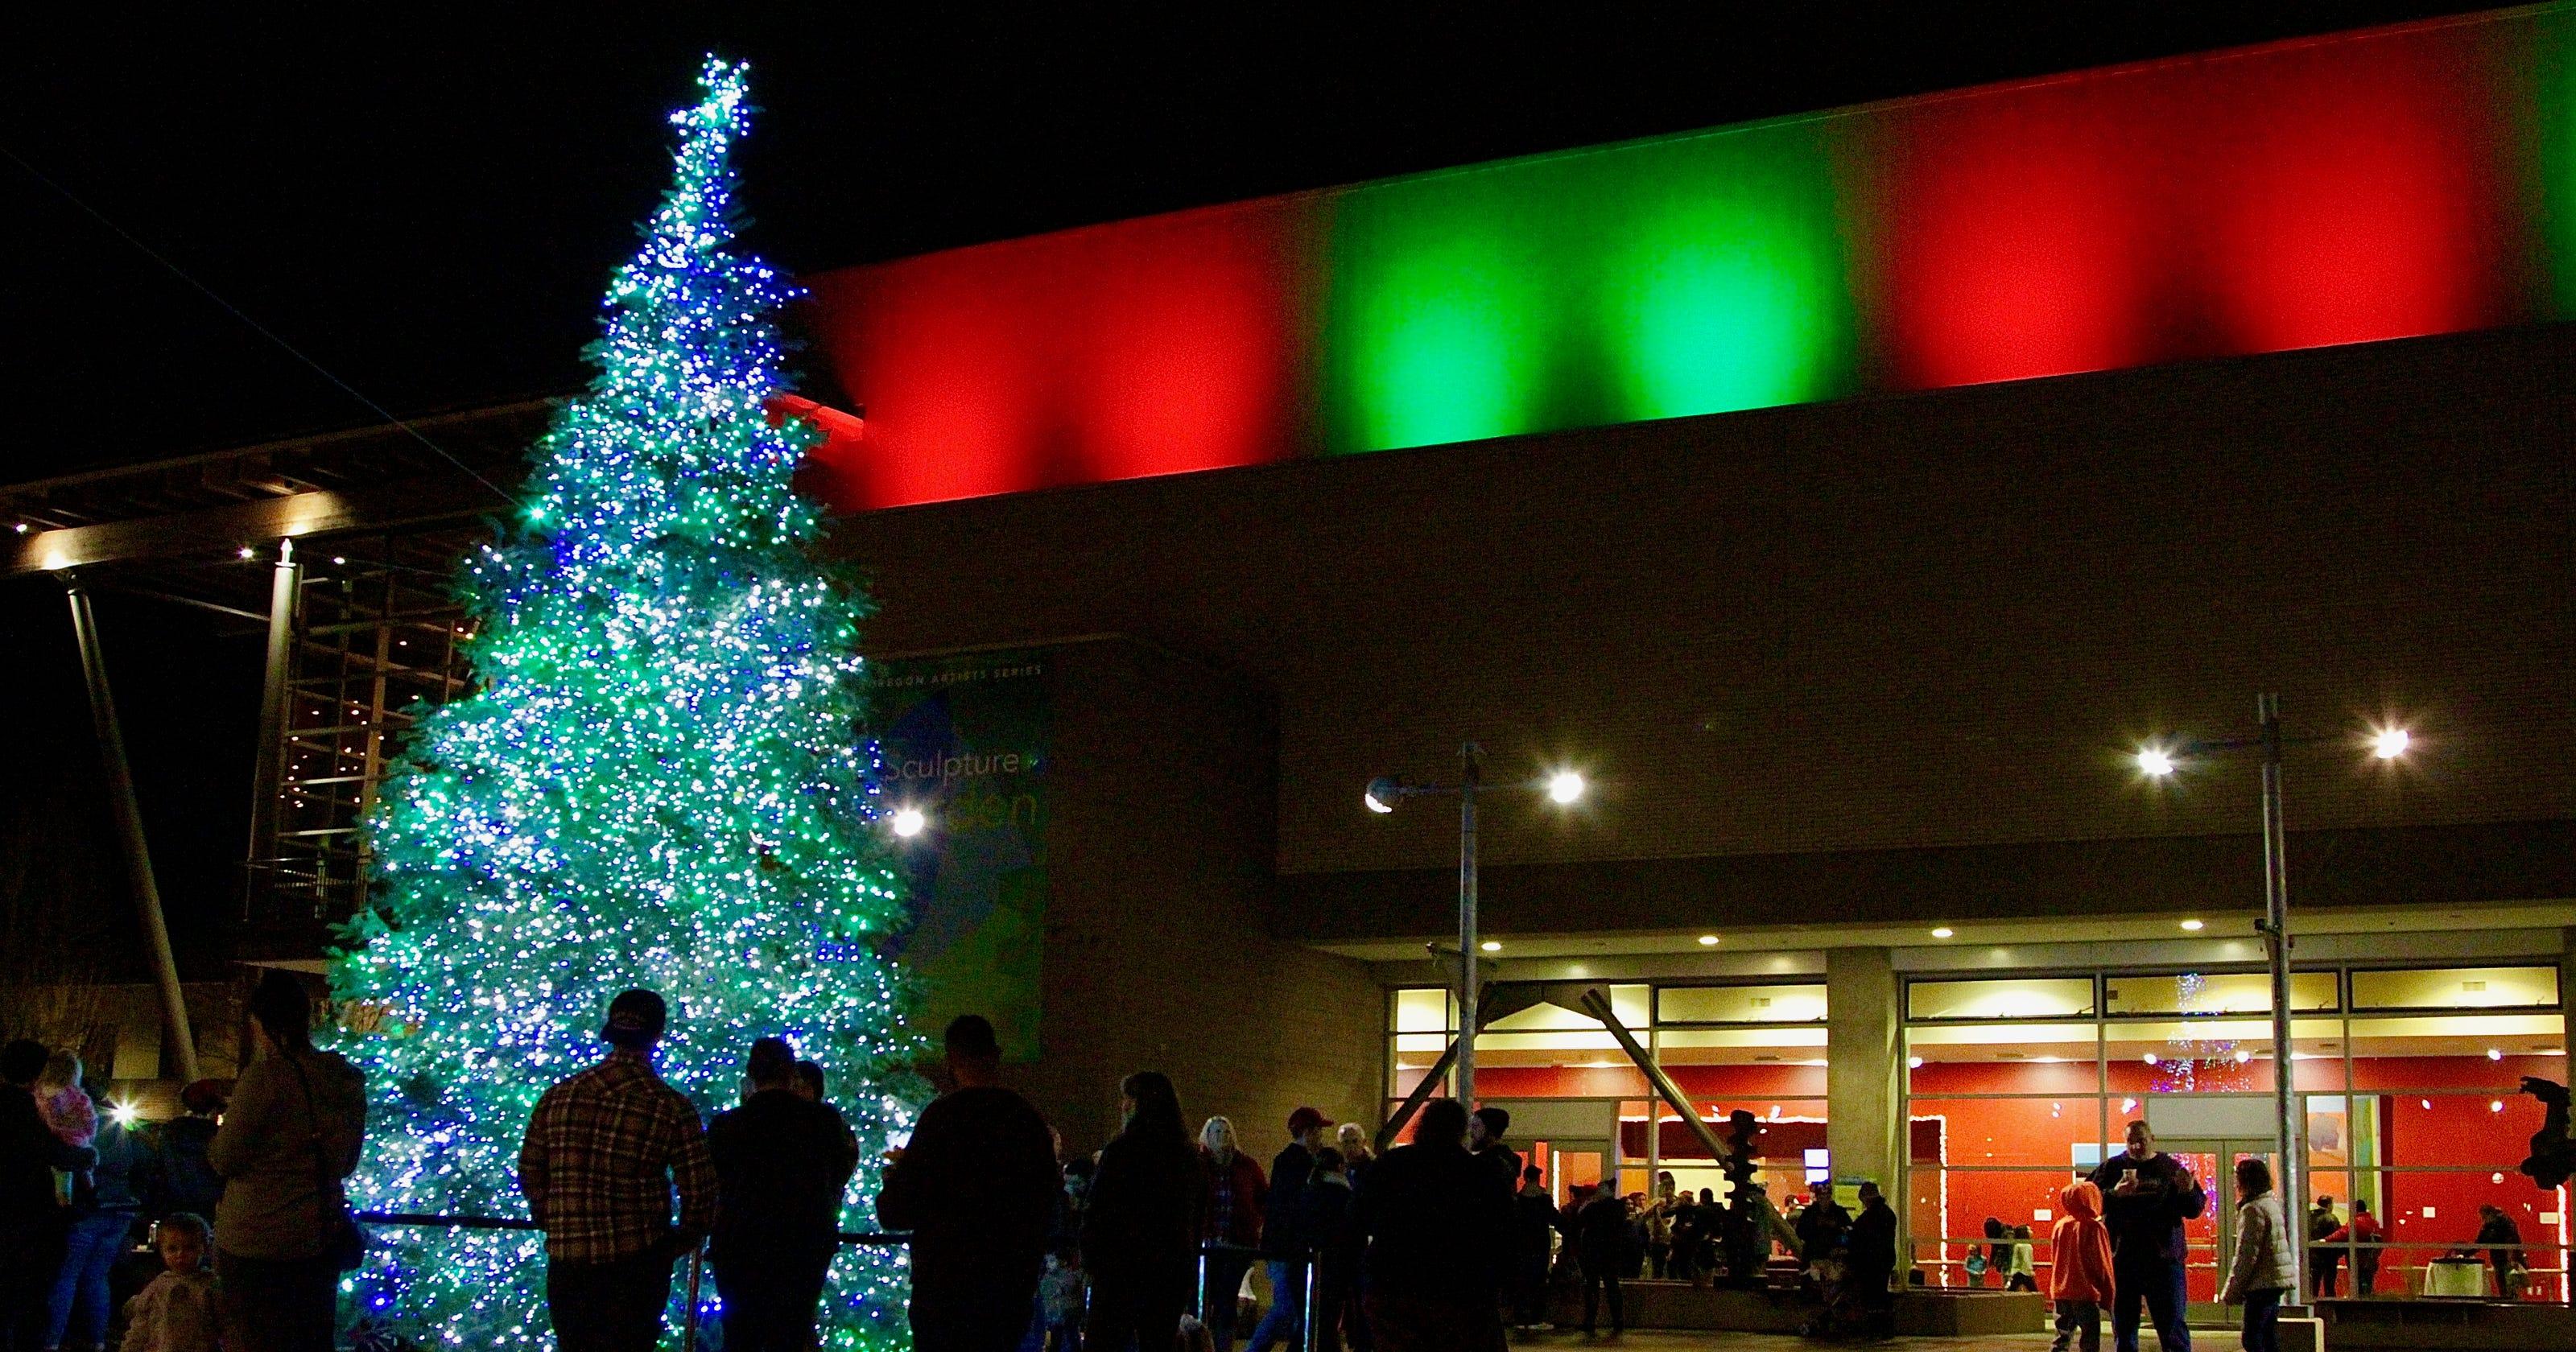 2018 holiday, Christmas tree lighting events in, around Salem, Oregon